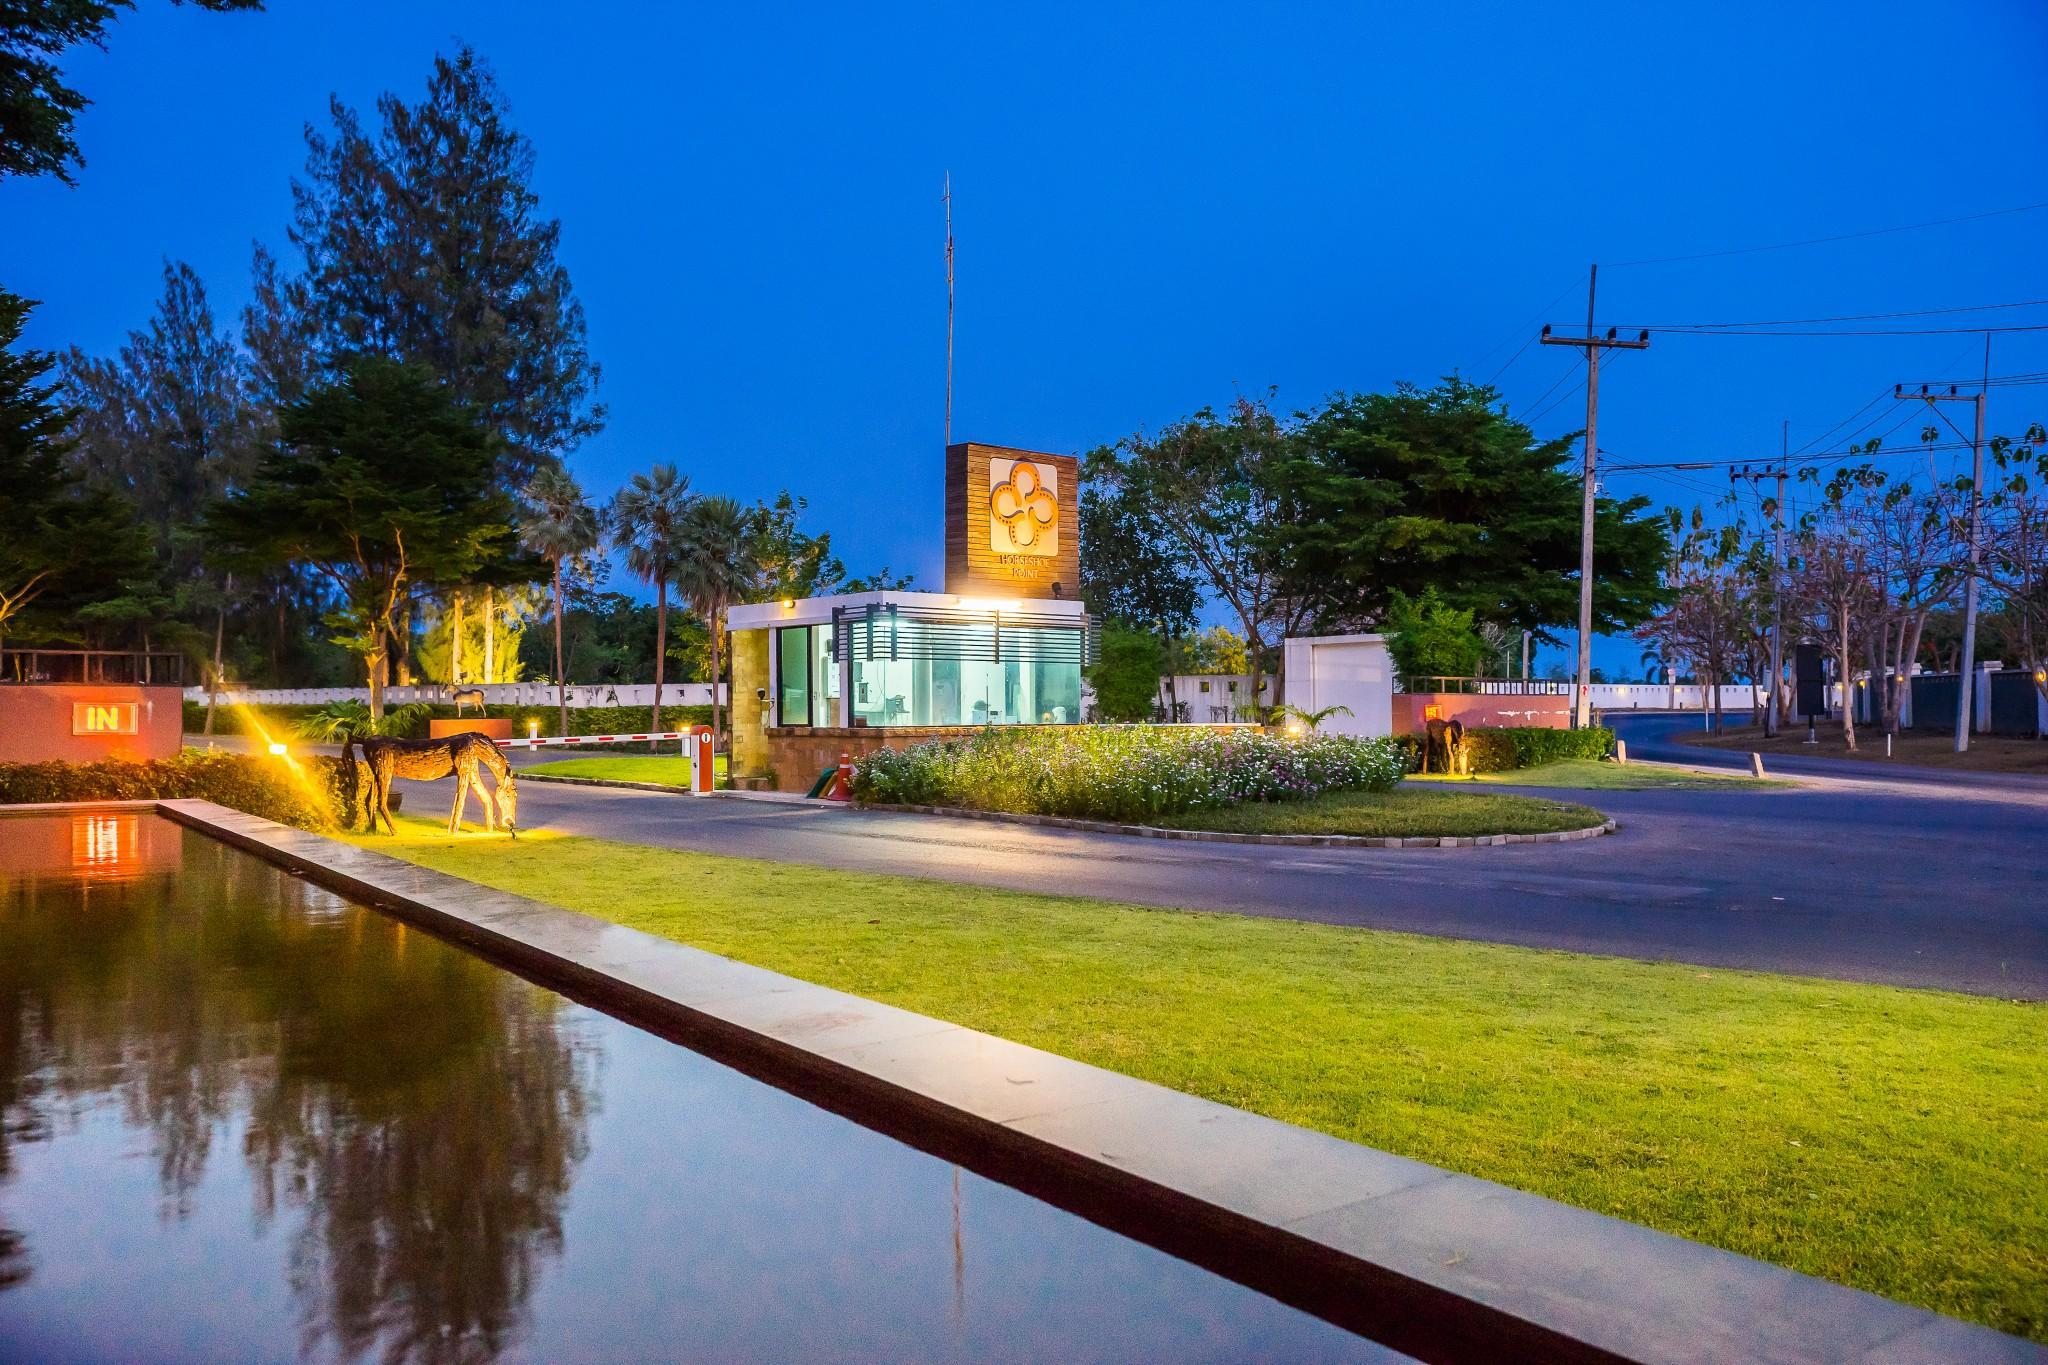 Horseshoe Point Resort & Country Club ฮอร์สชู พอยท์ รีสอร์ท แอนด์ คันทรี คลับ